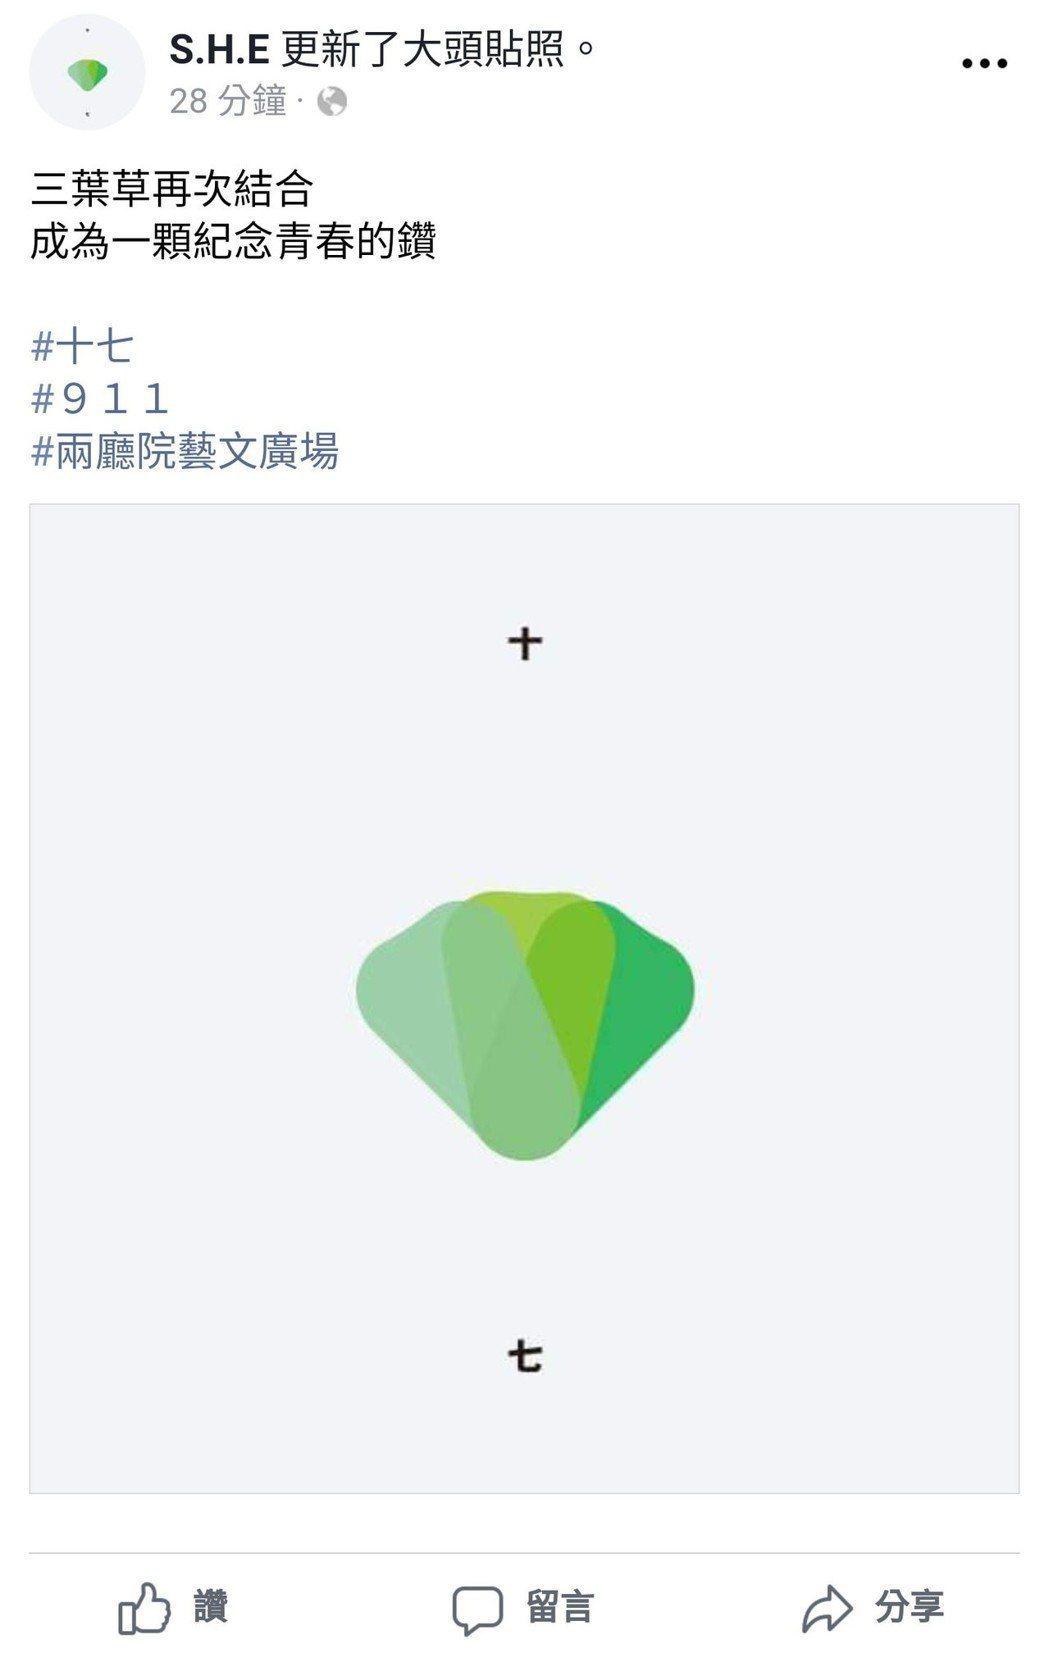 S.H.E公布17週年活動訊息。 圖/擷自S.H.E臉書